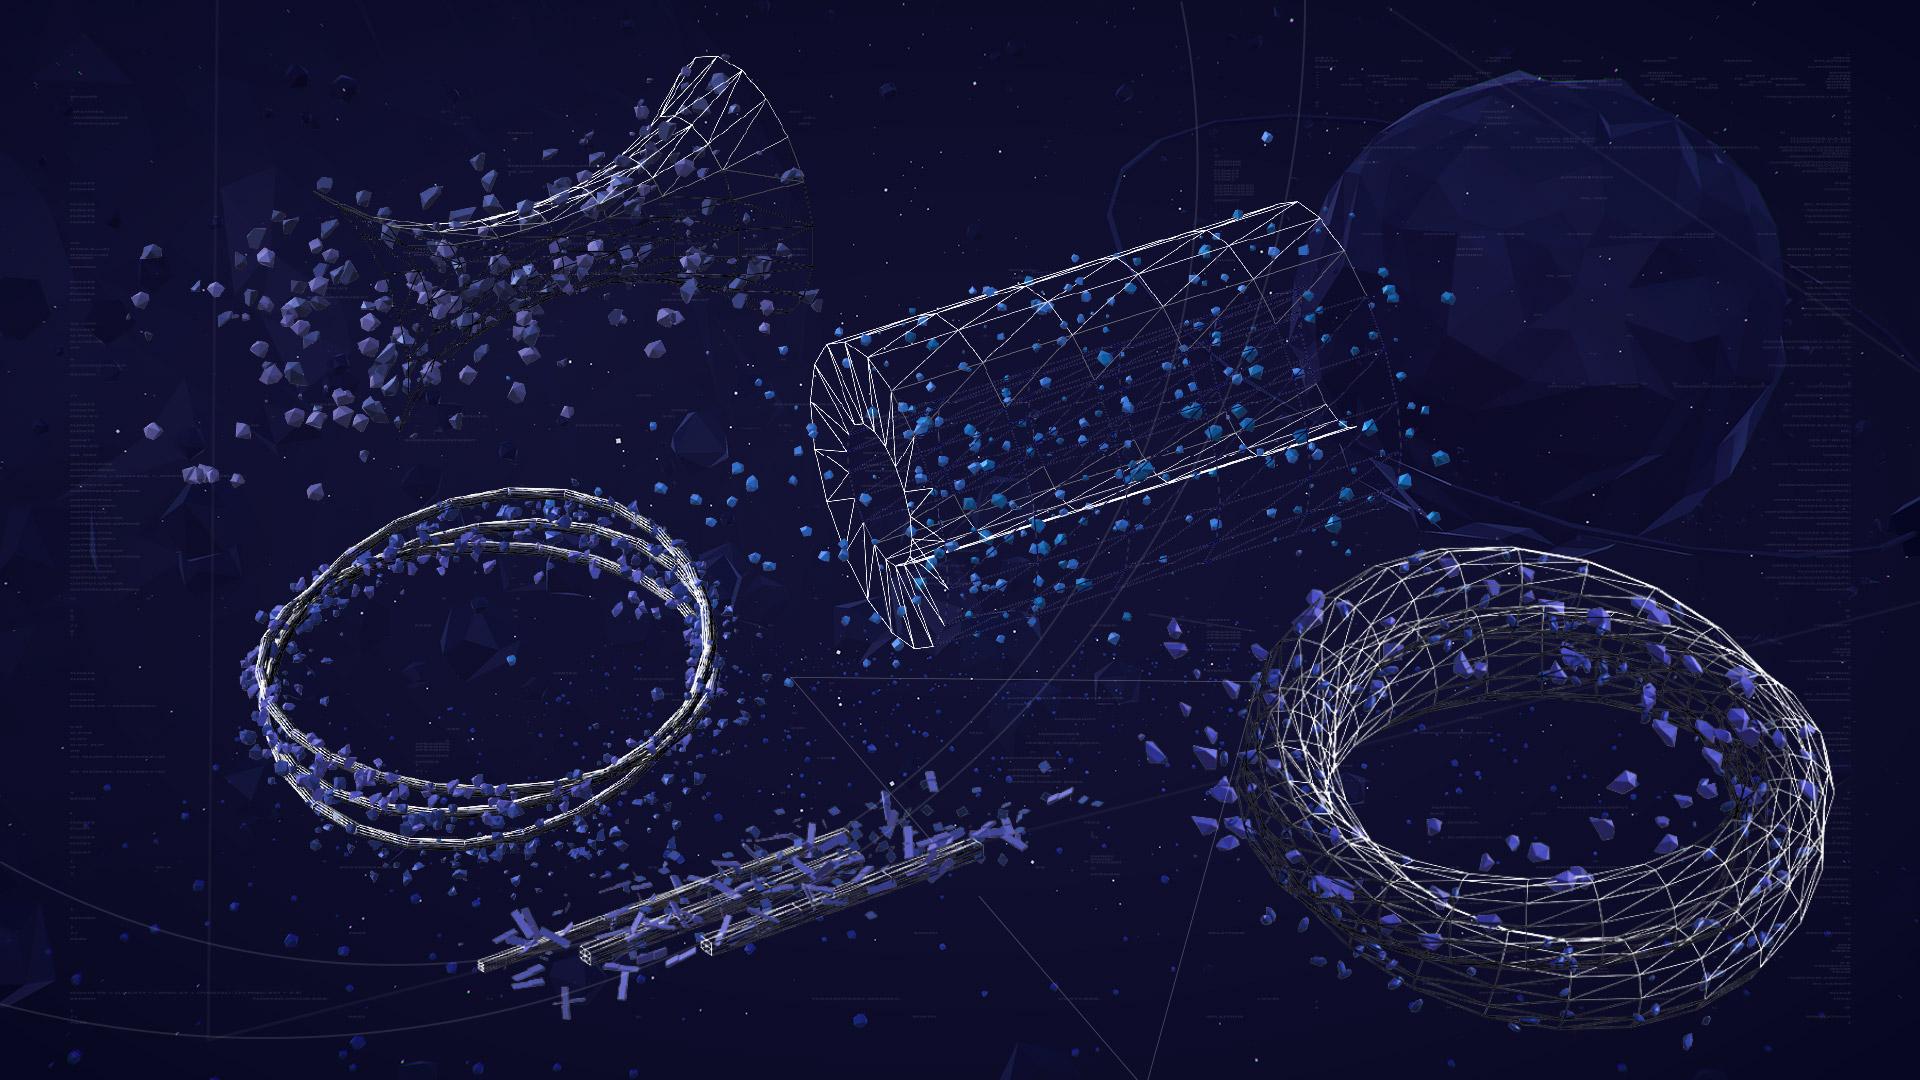 Space_Journey_Unity3D_AssetStore_Rings.jpg